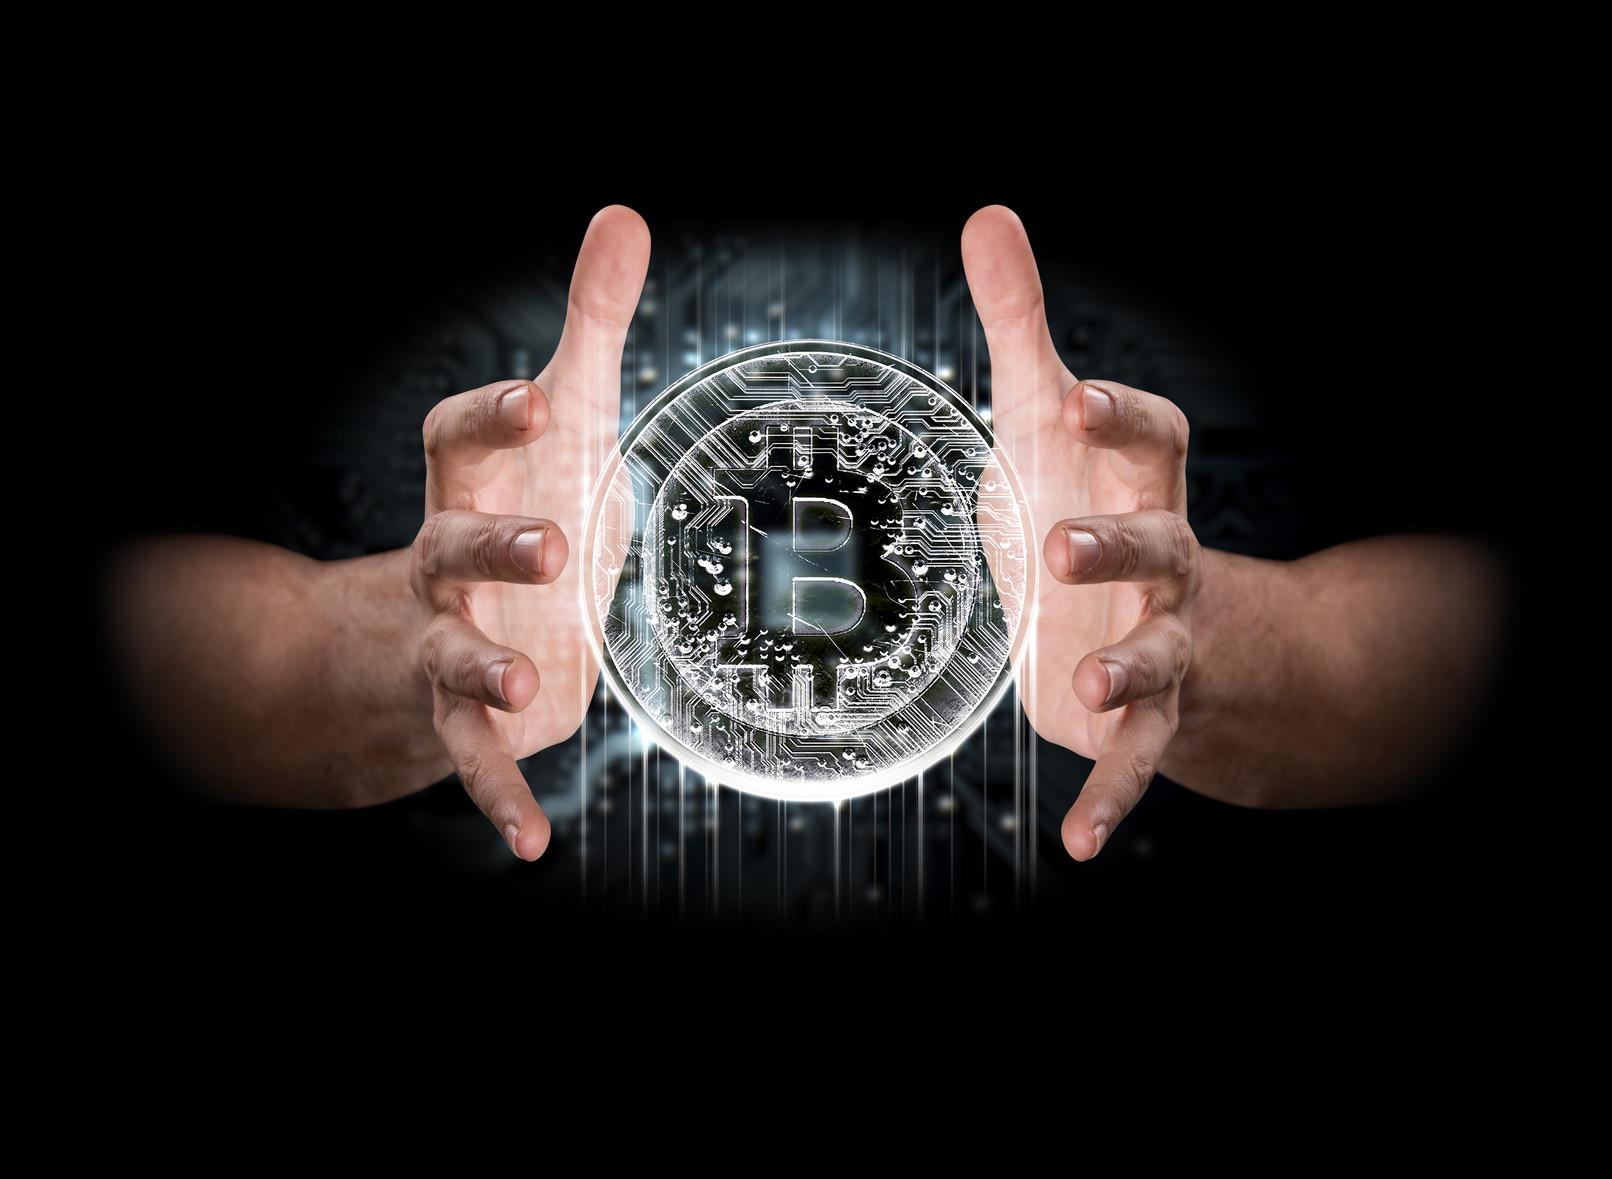 Krytpowaluty, bitcoin